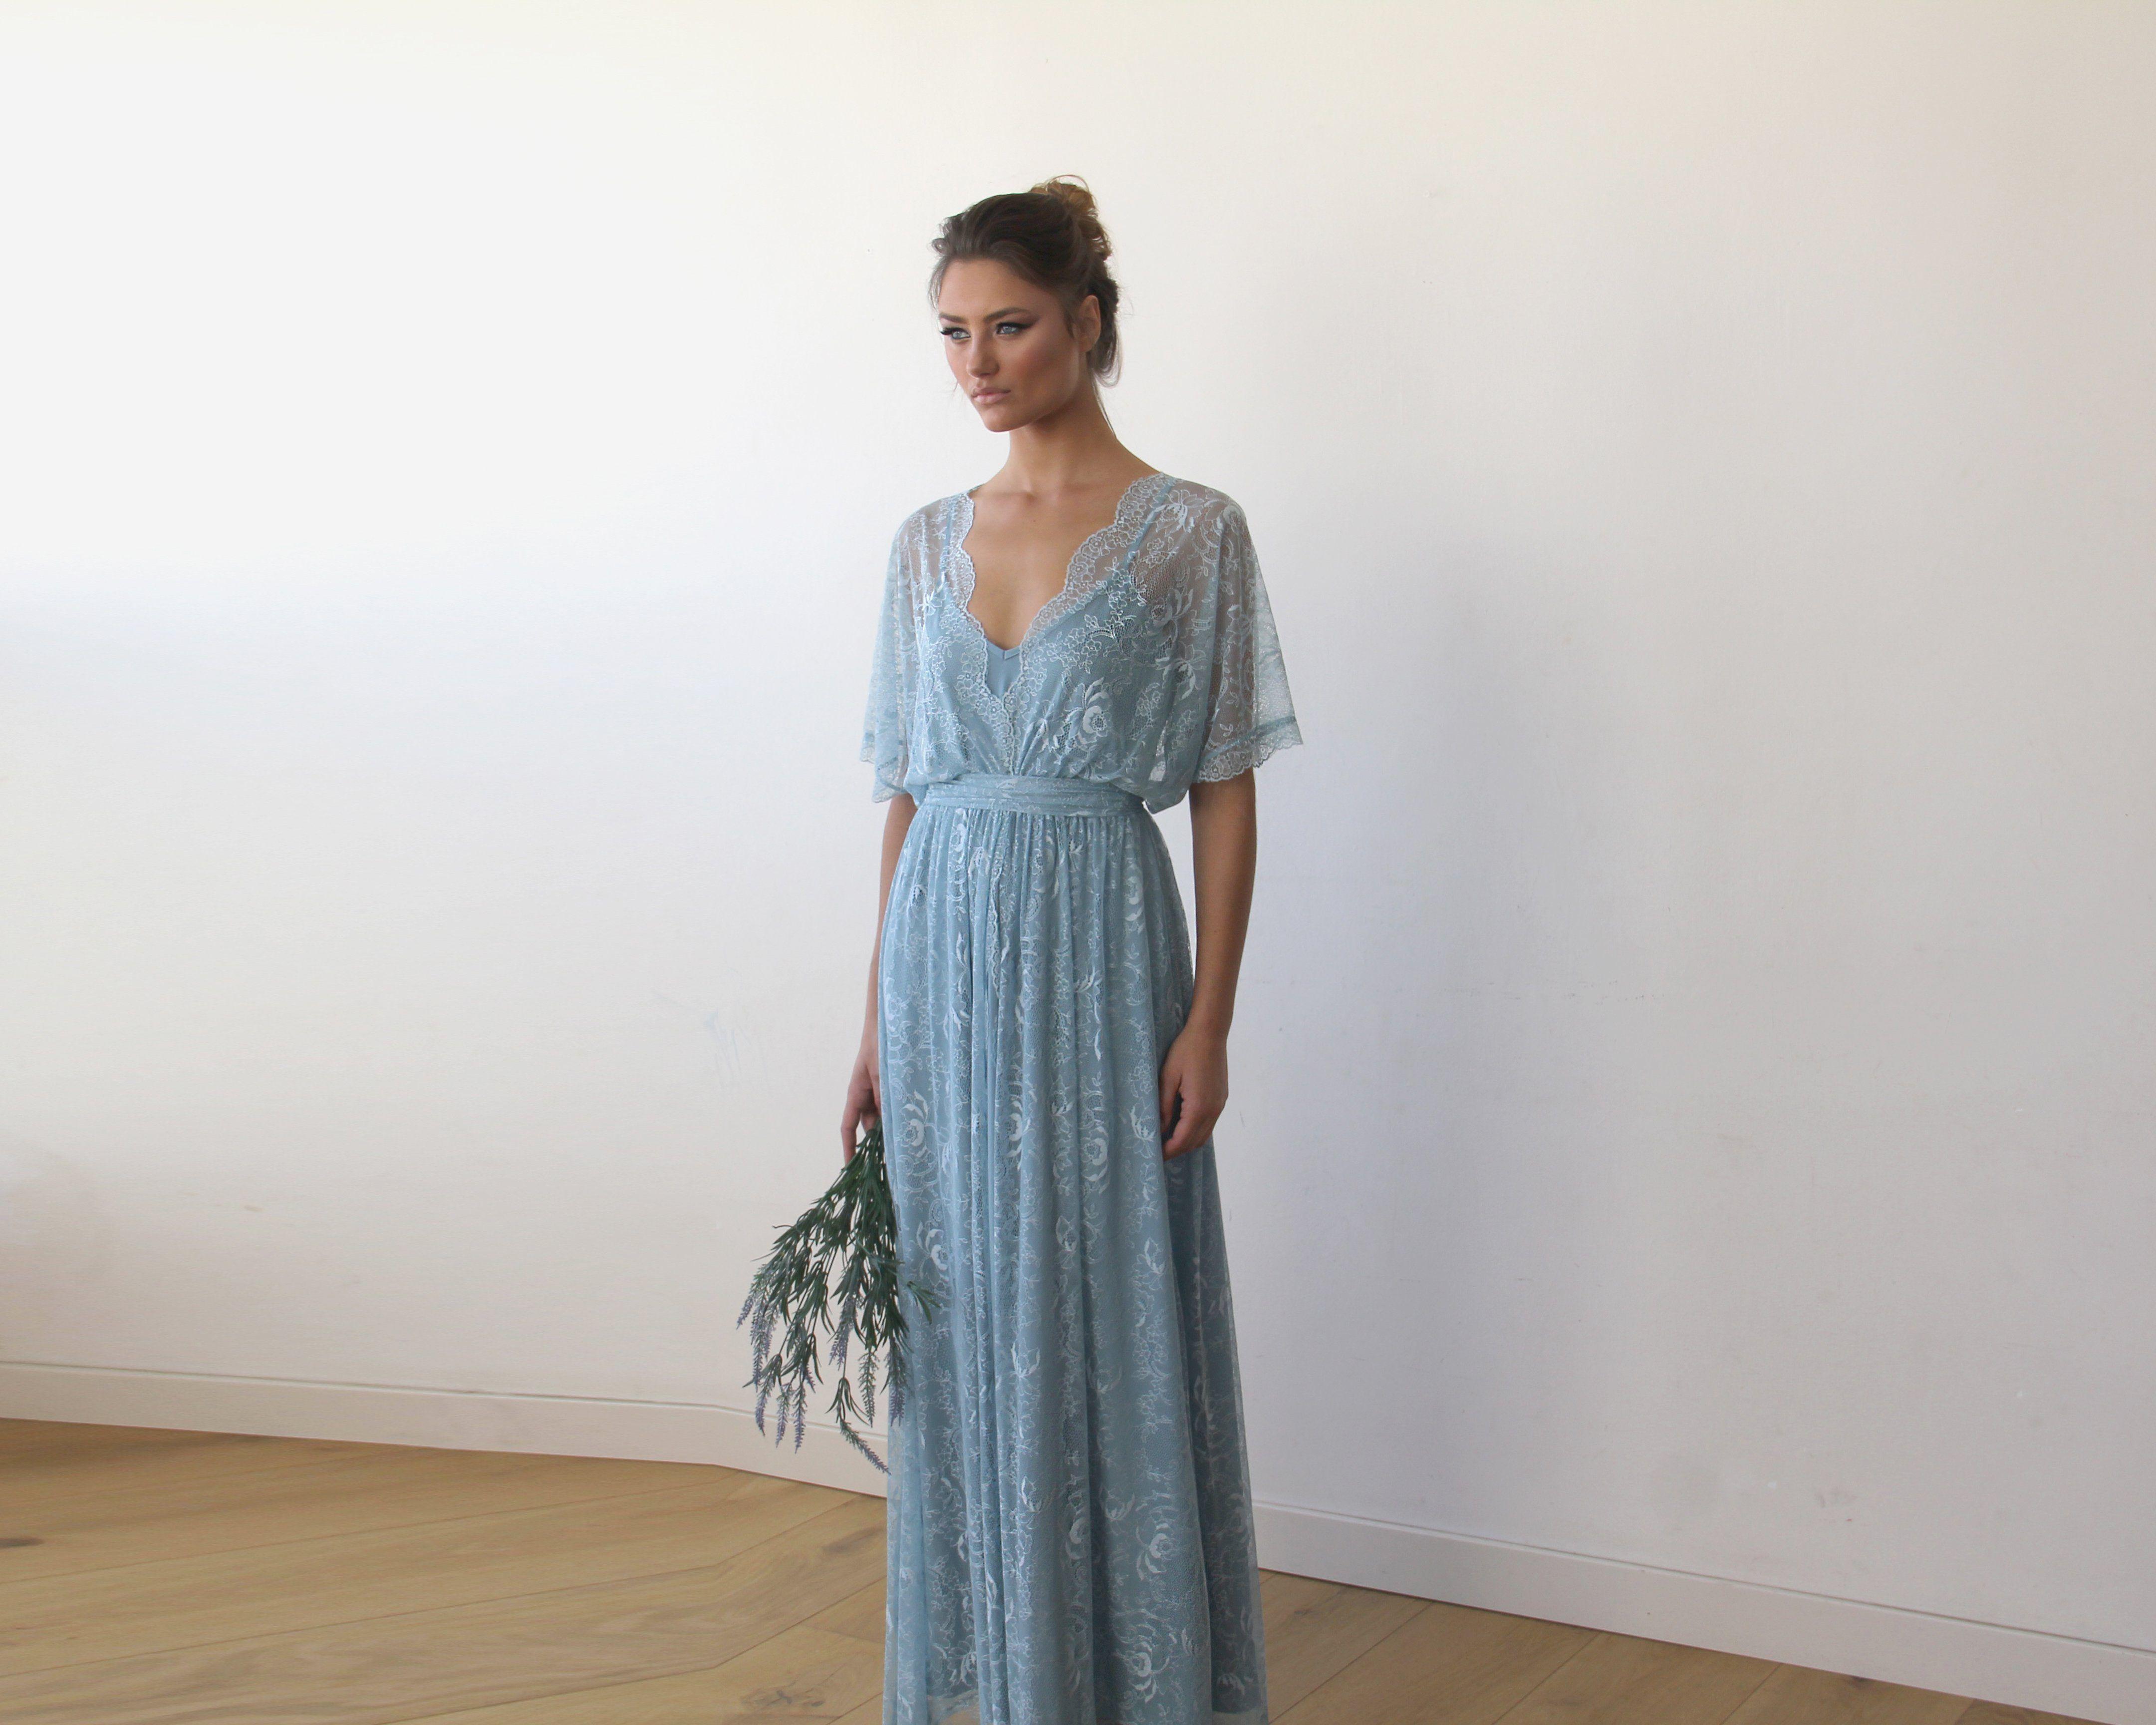 Maxi dress for wedding  Aqua Blue sheer lace maxi dress   Weddings